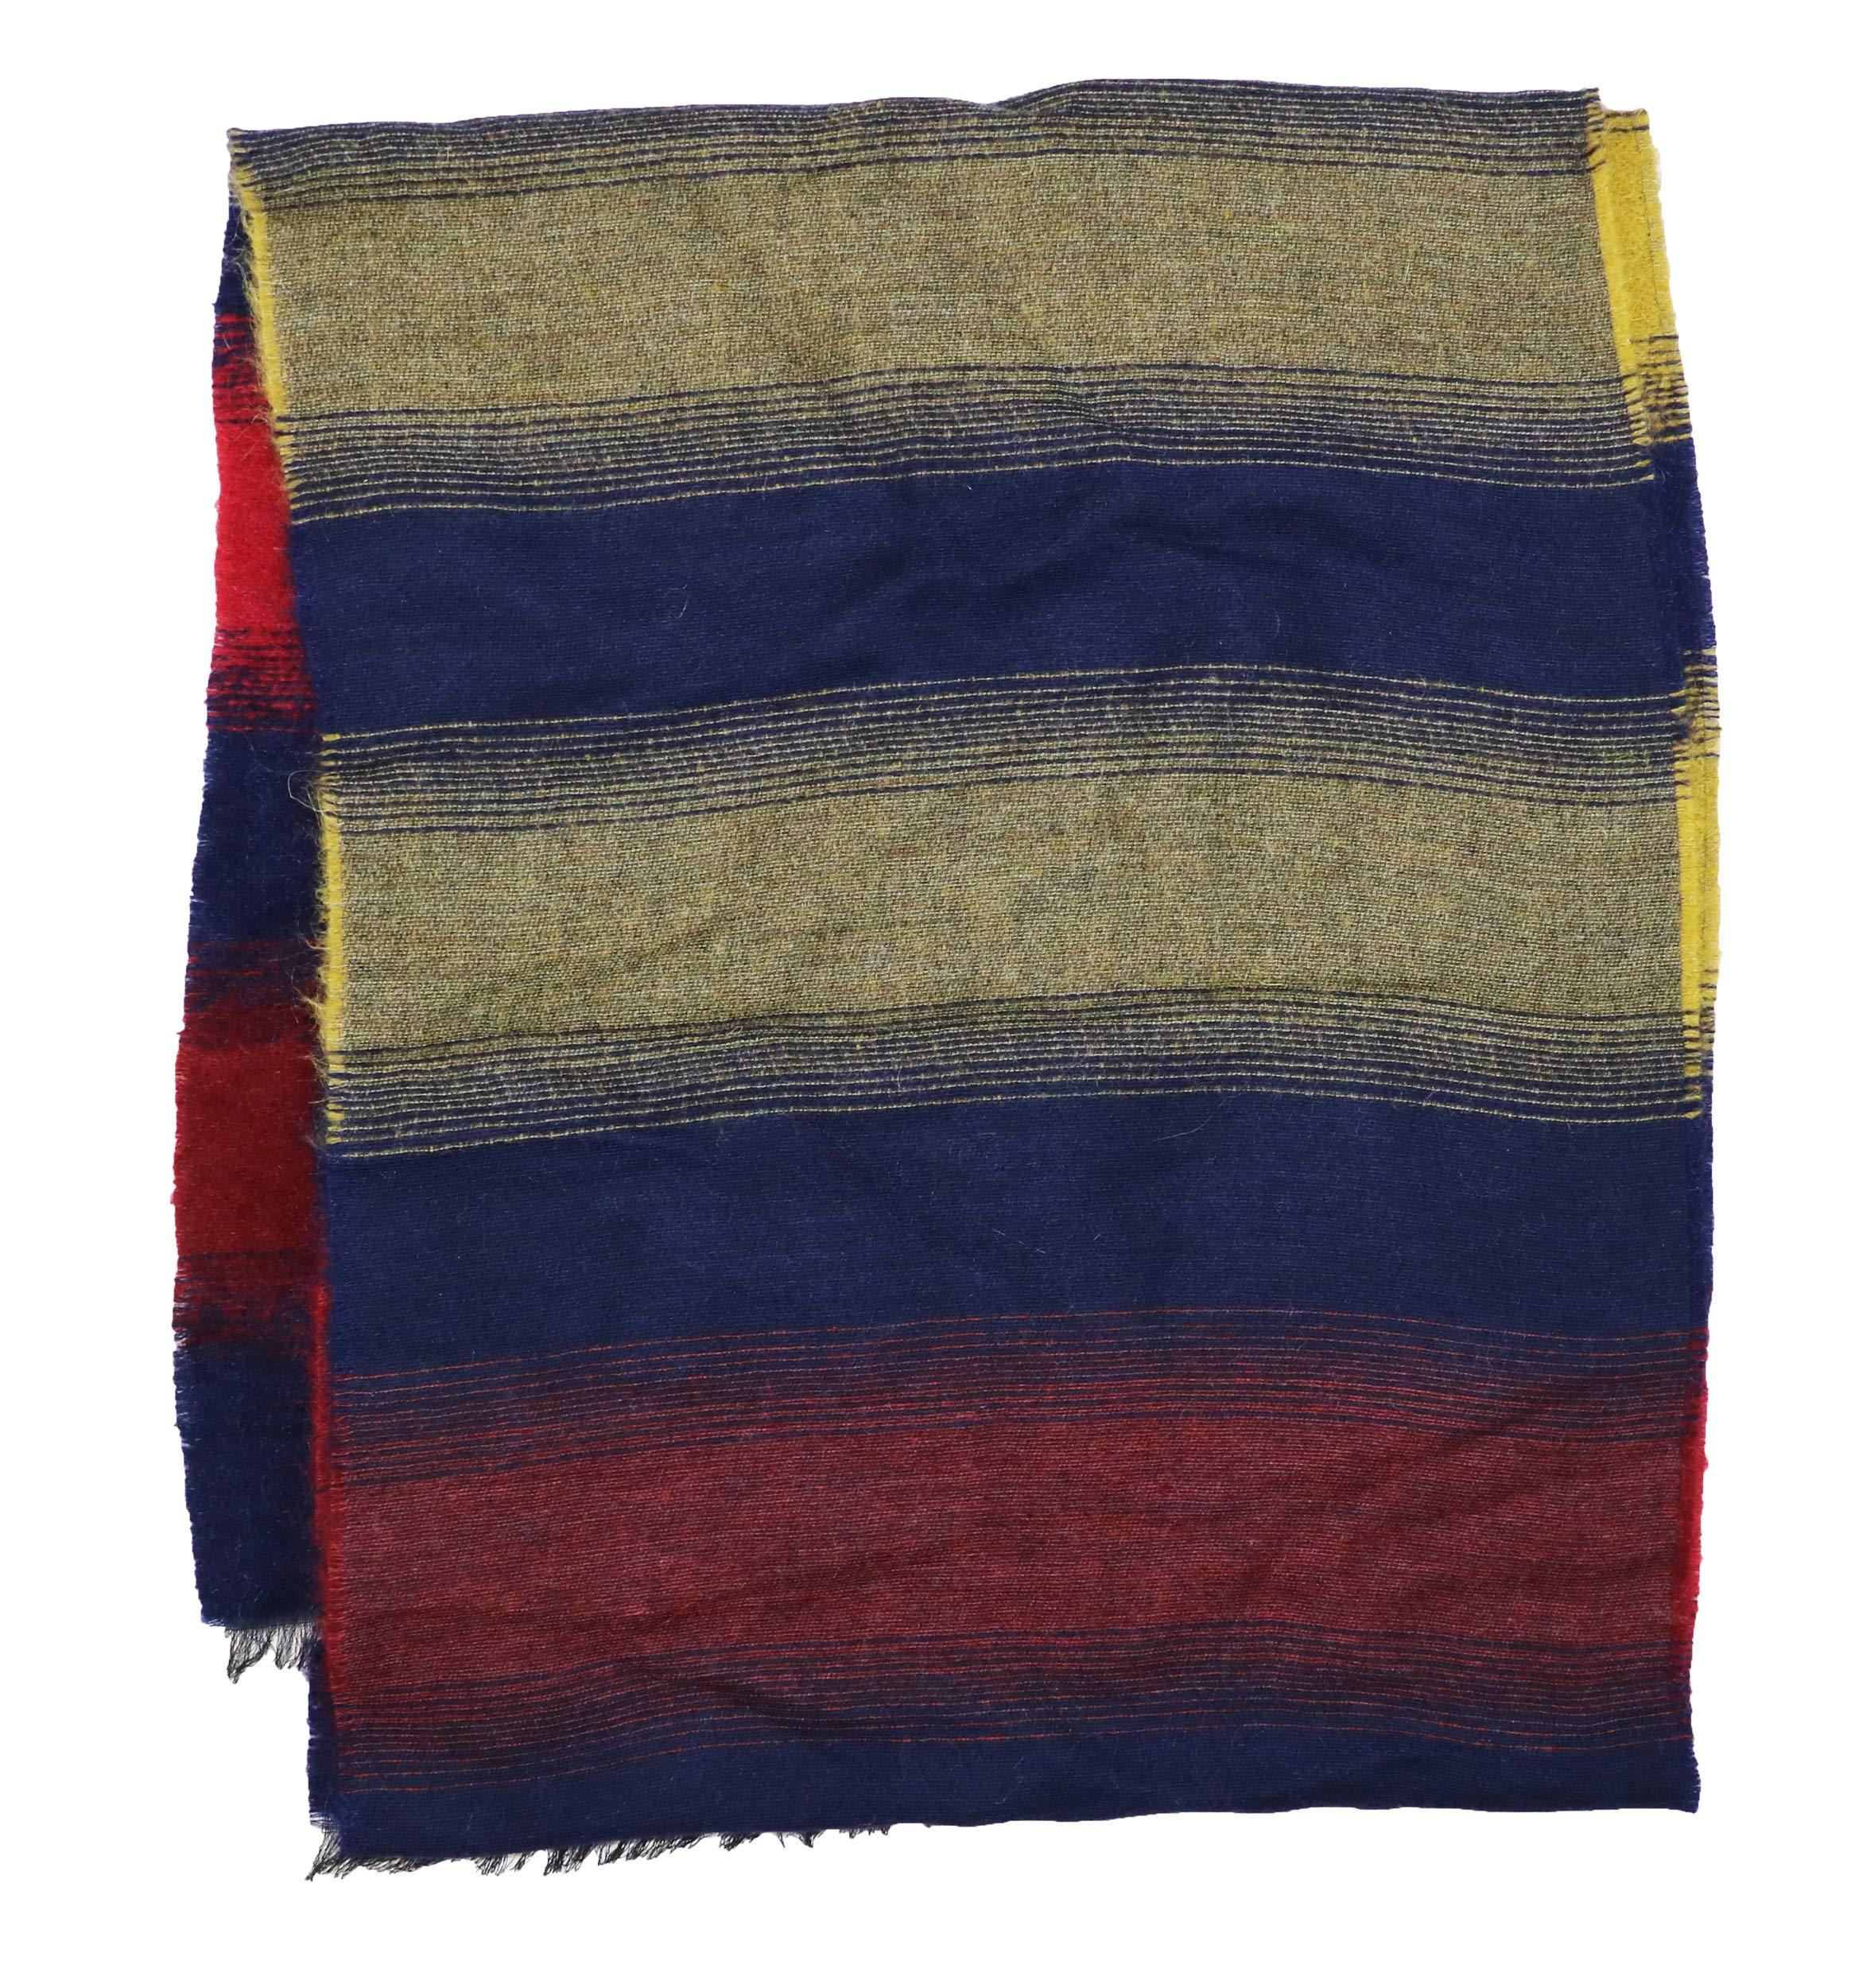 Paul Smith Mohair Blend Striped Fine Knit Men's Fringe Scarf (Navy, One Size)